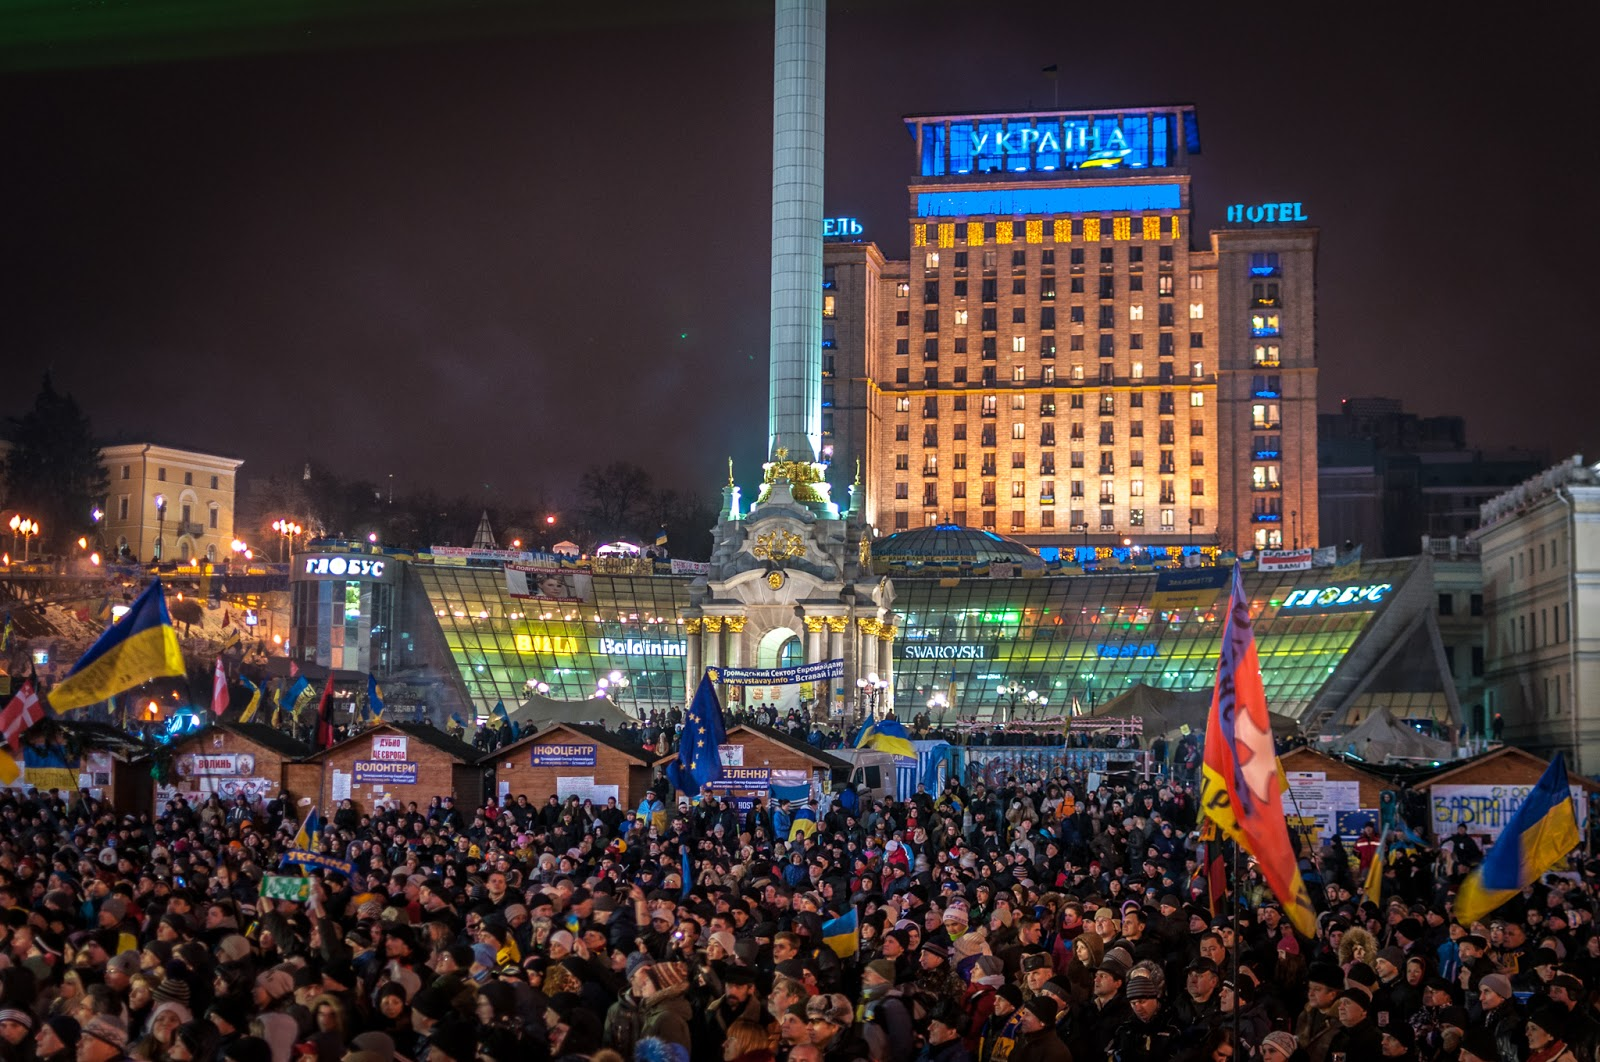 2013.12.15 Euromaidan, Kiev, Ukraine 36